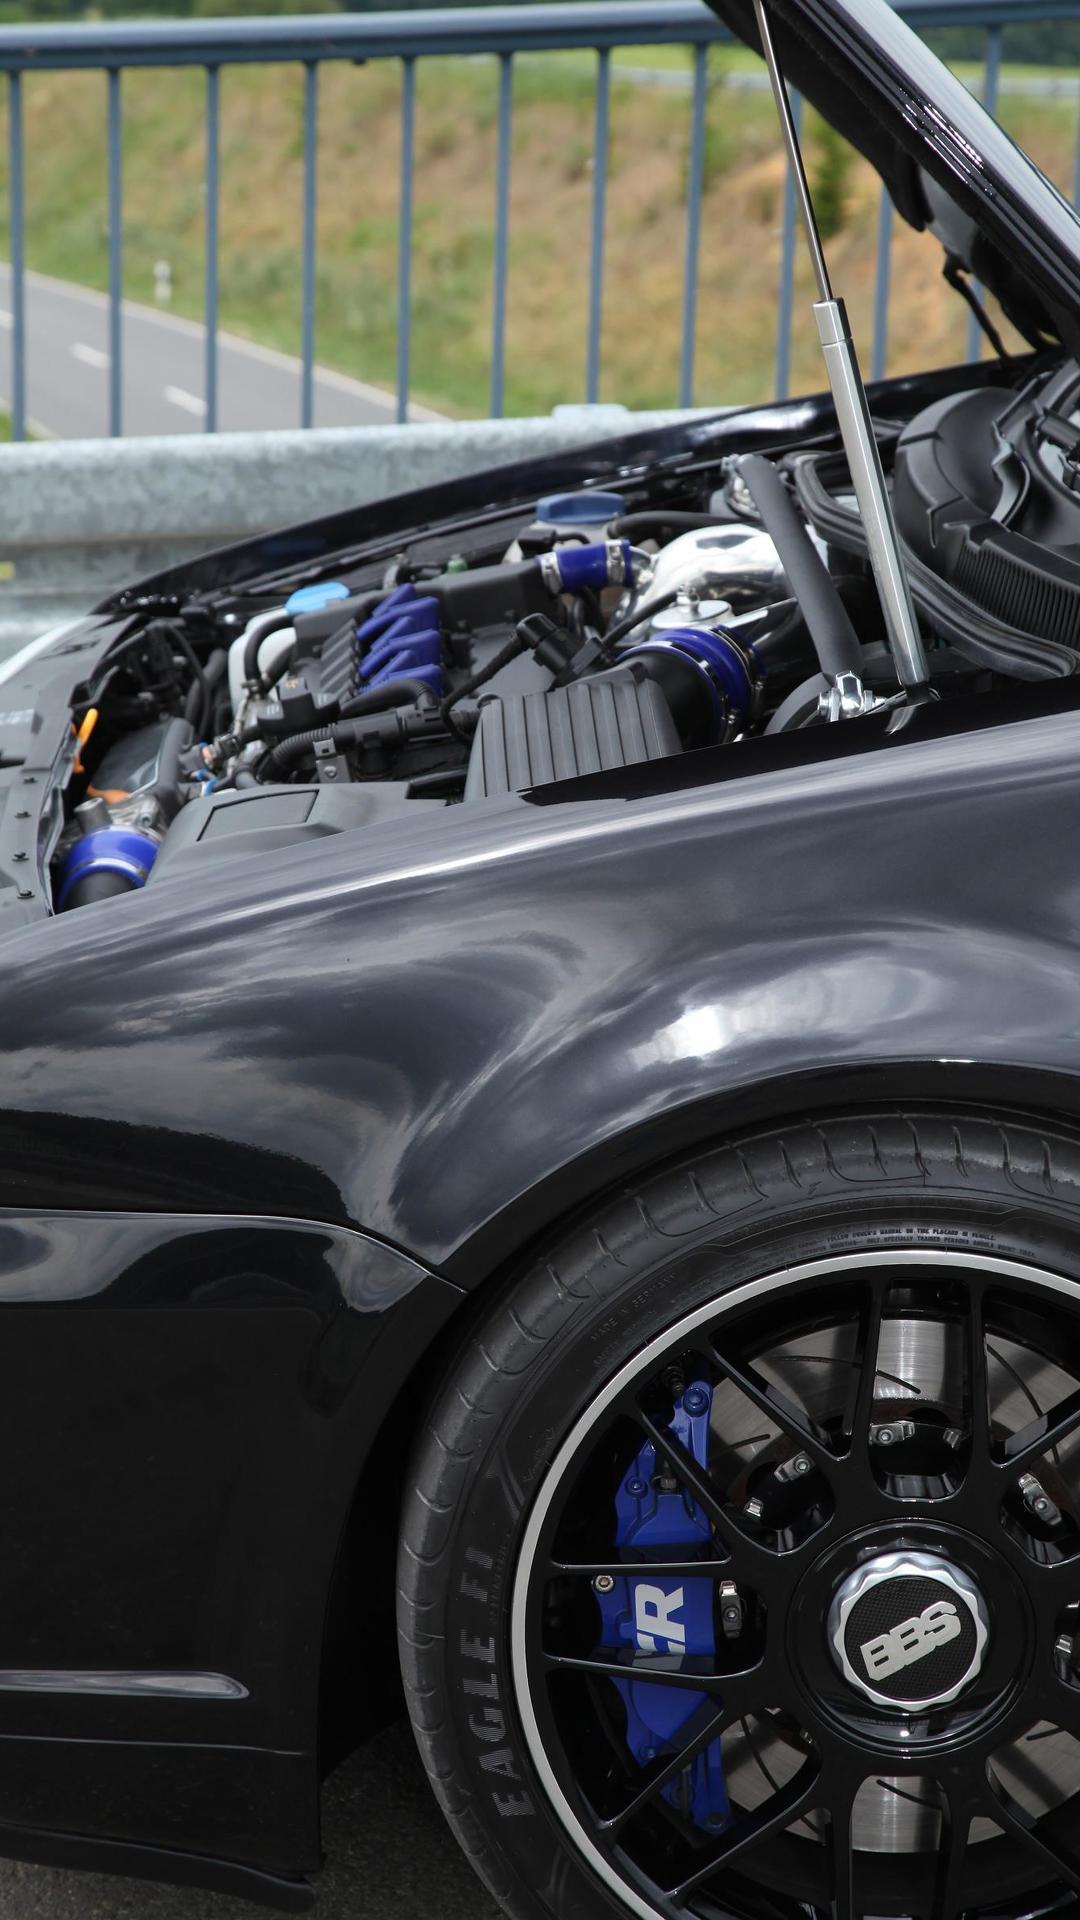 Под капотом Volkswagen Golf IV R32 от HPerformance